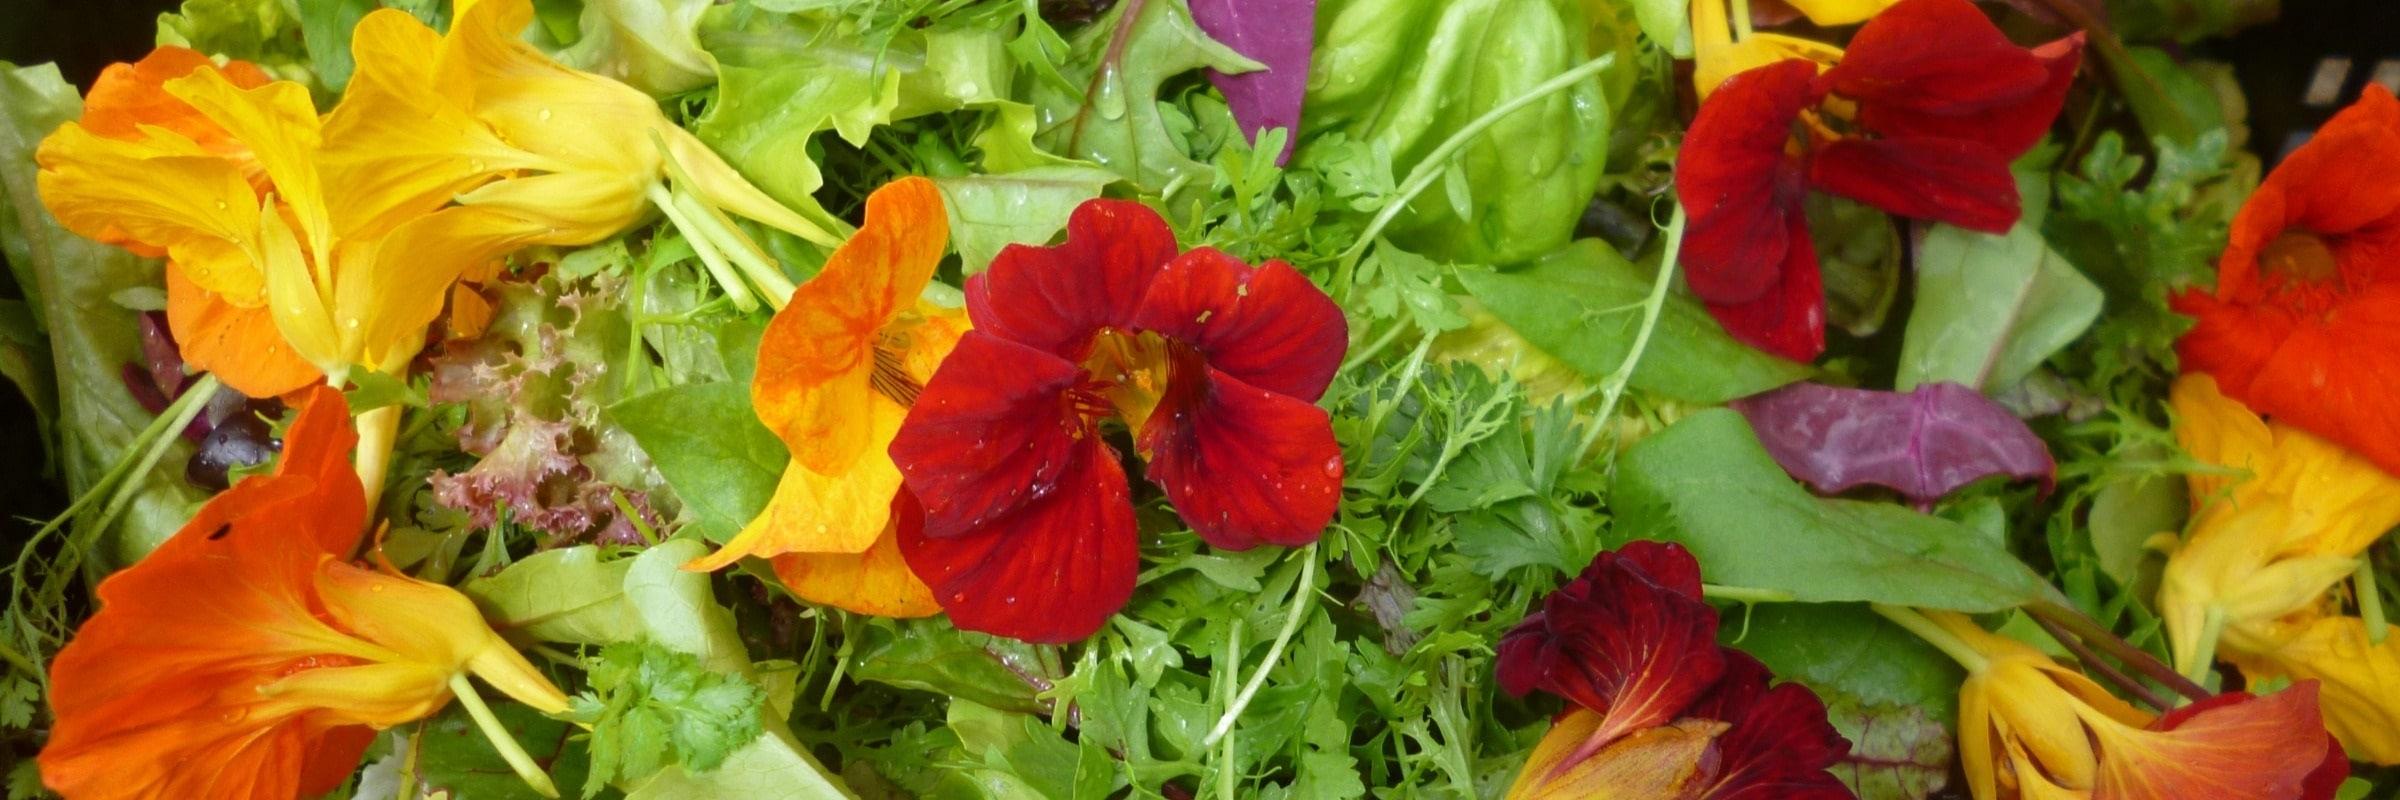 growing flowers for website